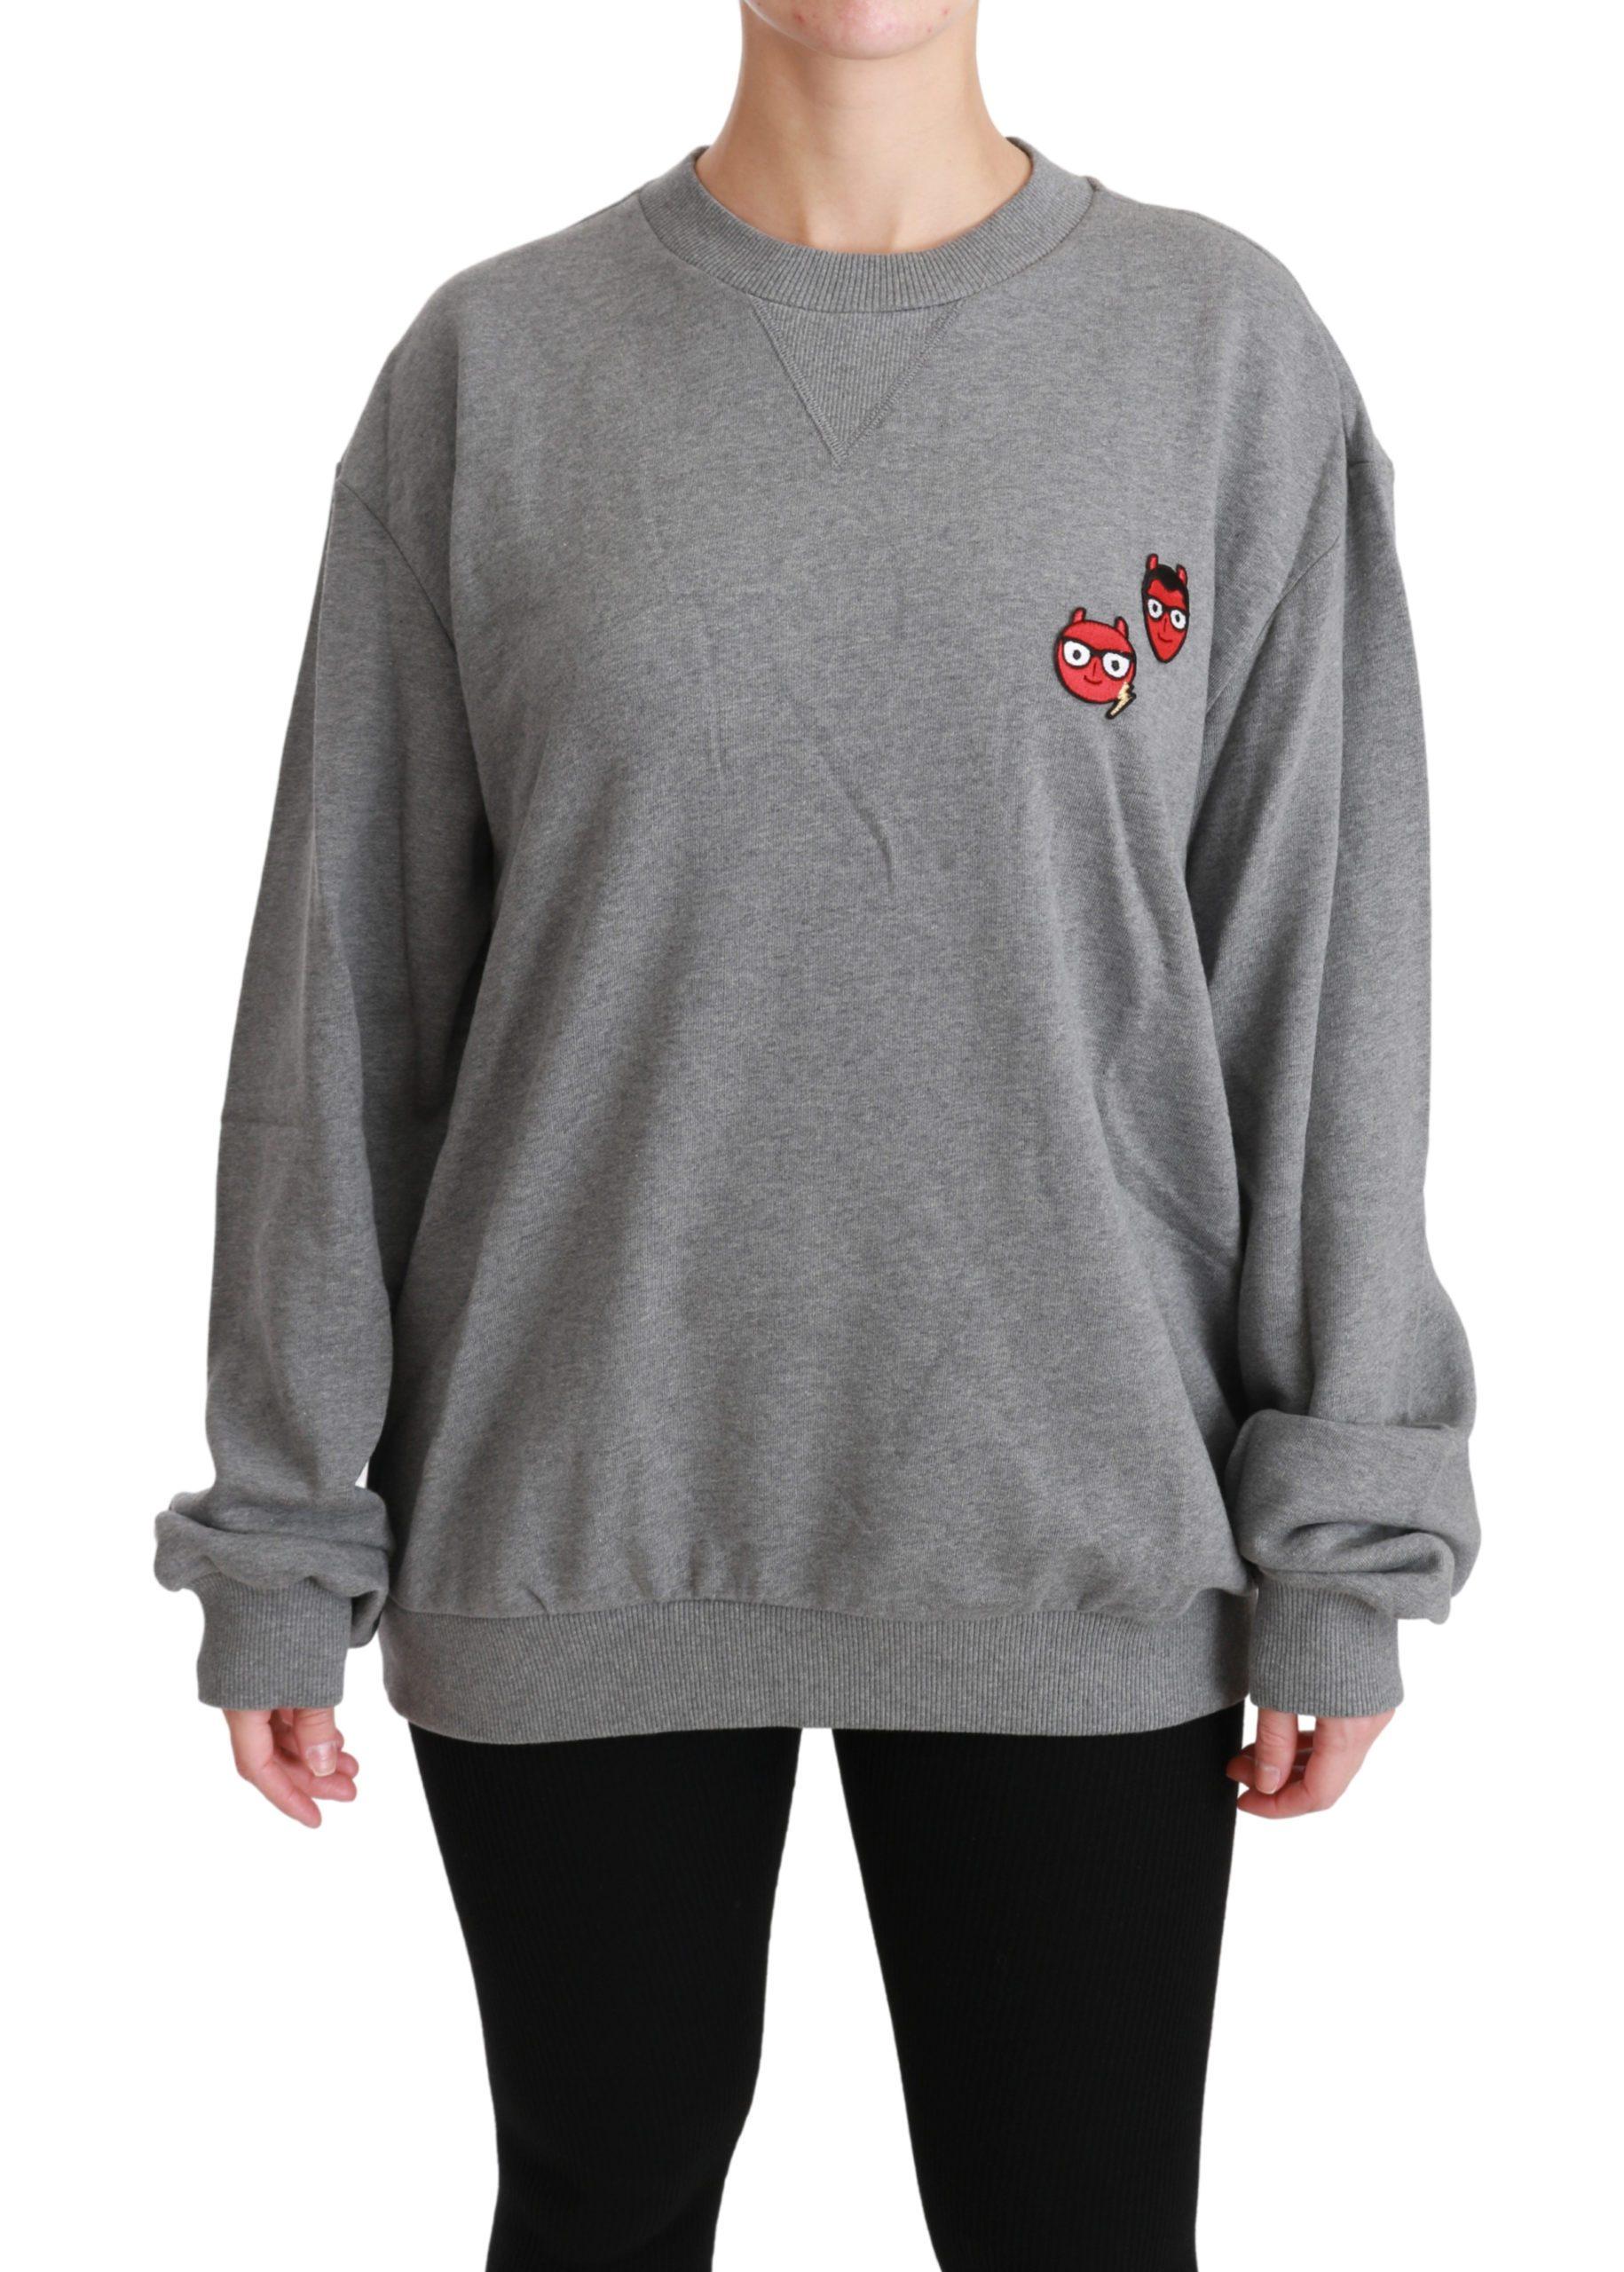 Dolce & Gabbana Women's #dgfamily Pullover Cotton Sweater Gray TSH4508 - IT44|L